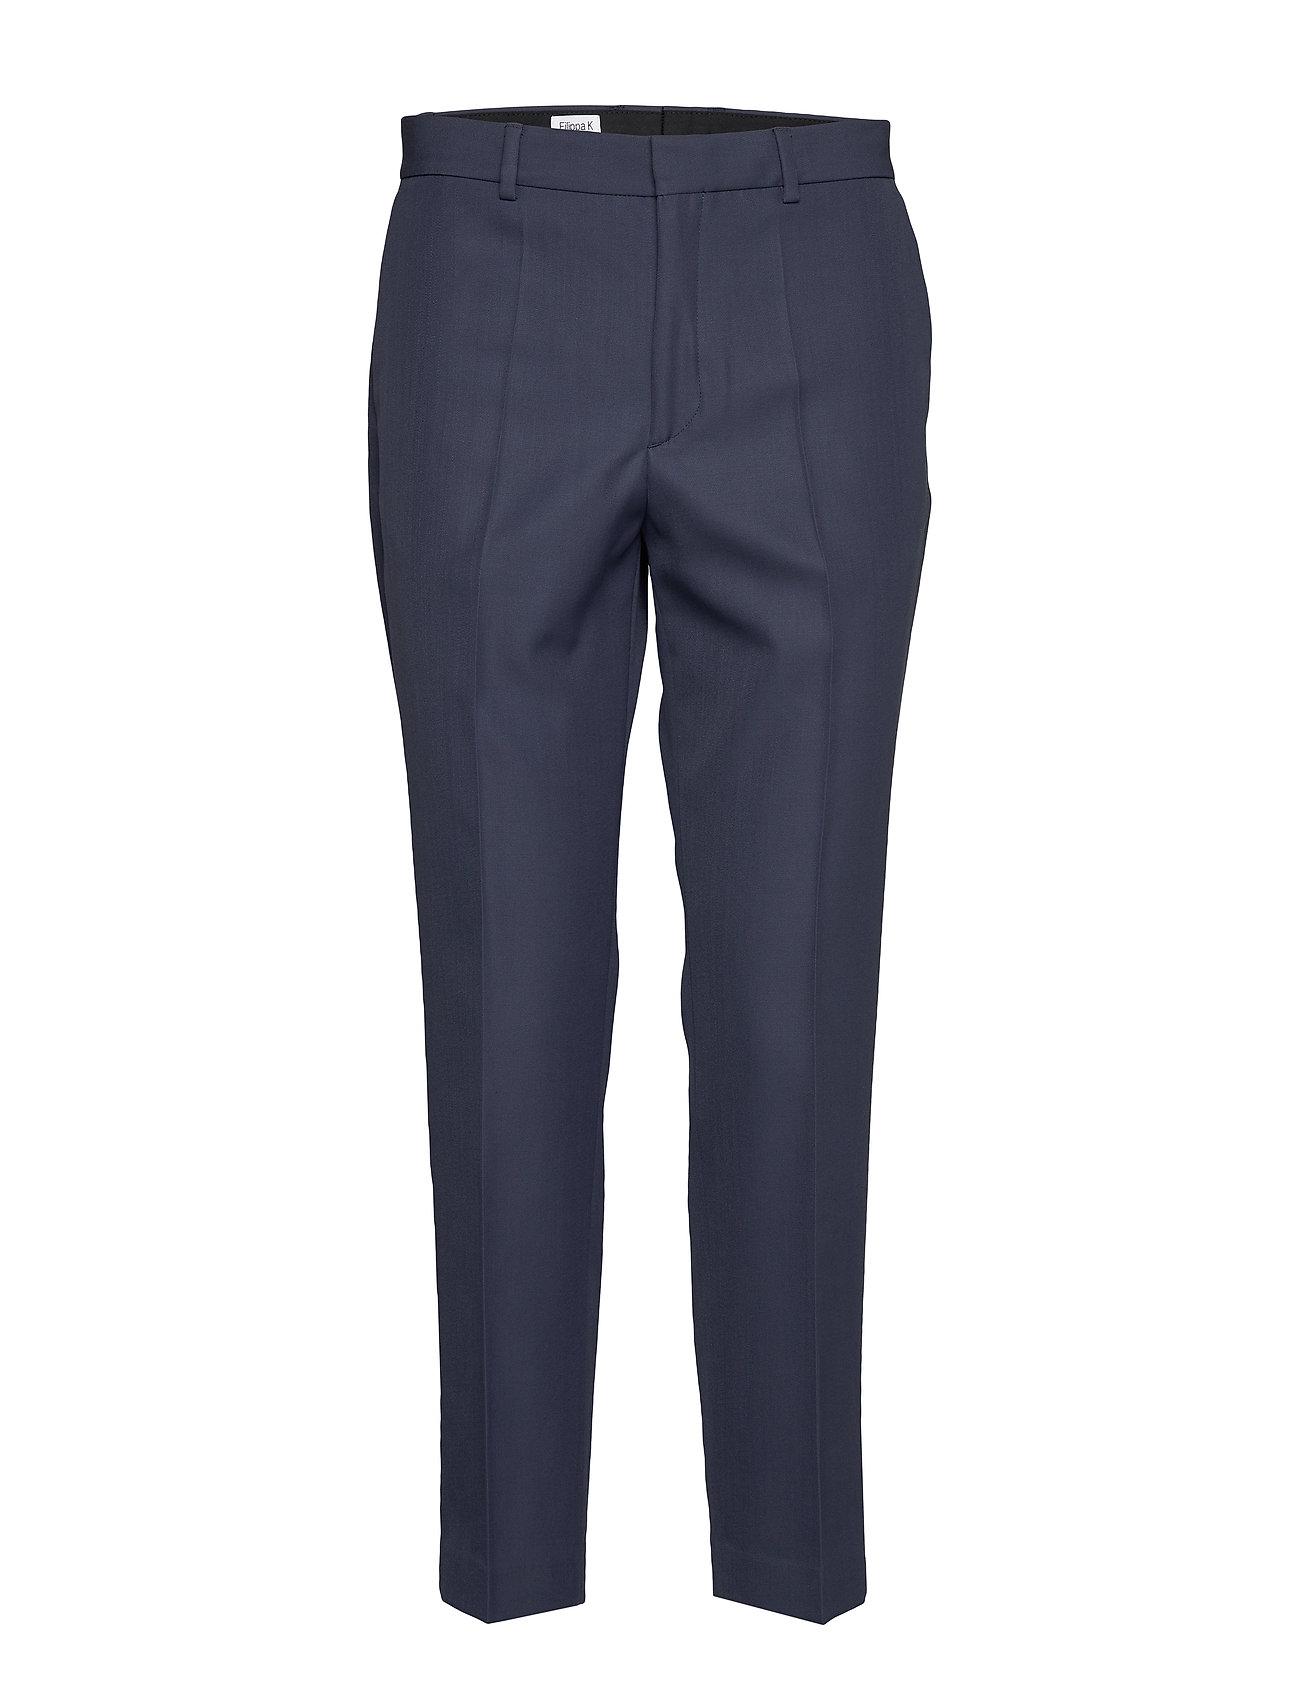 Image of Emma Suiting Trouser Bukser Med Lige Ben Blå Filippa K (3232787479)